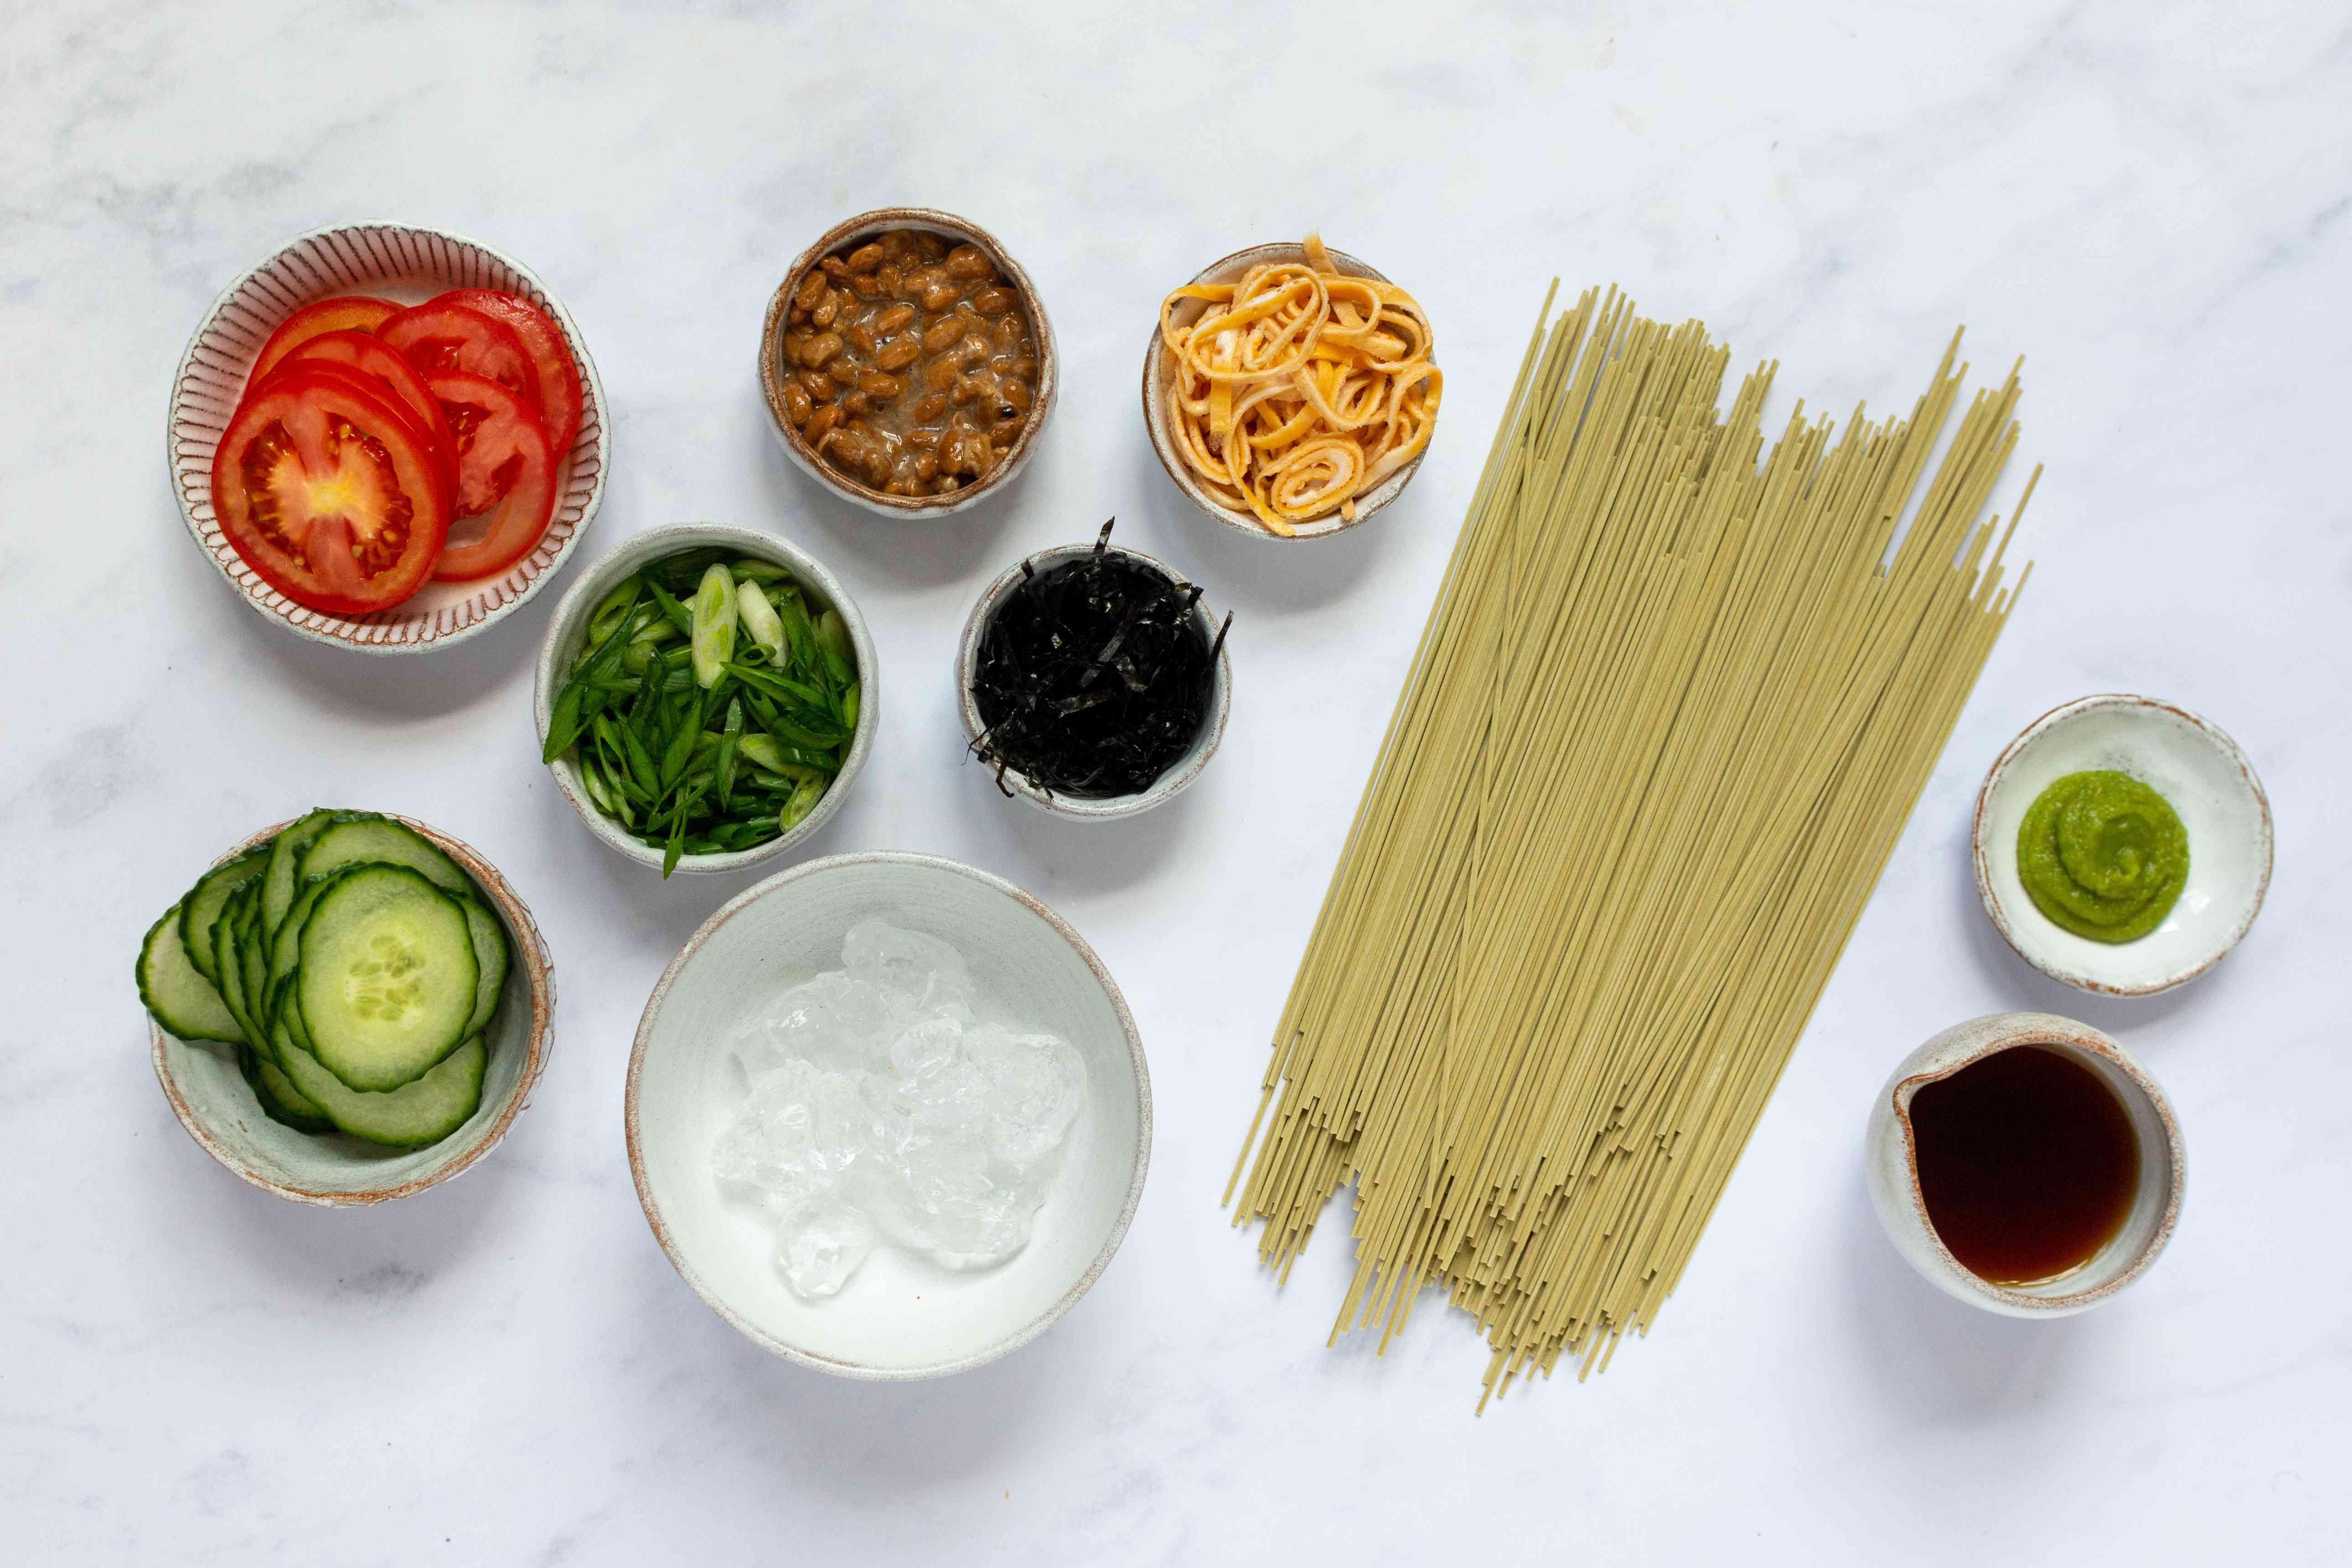 Cold Green Tea Soba Noodles (Cha Soba) ingredients